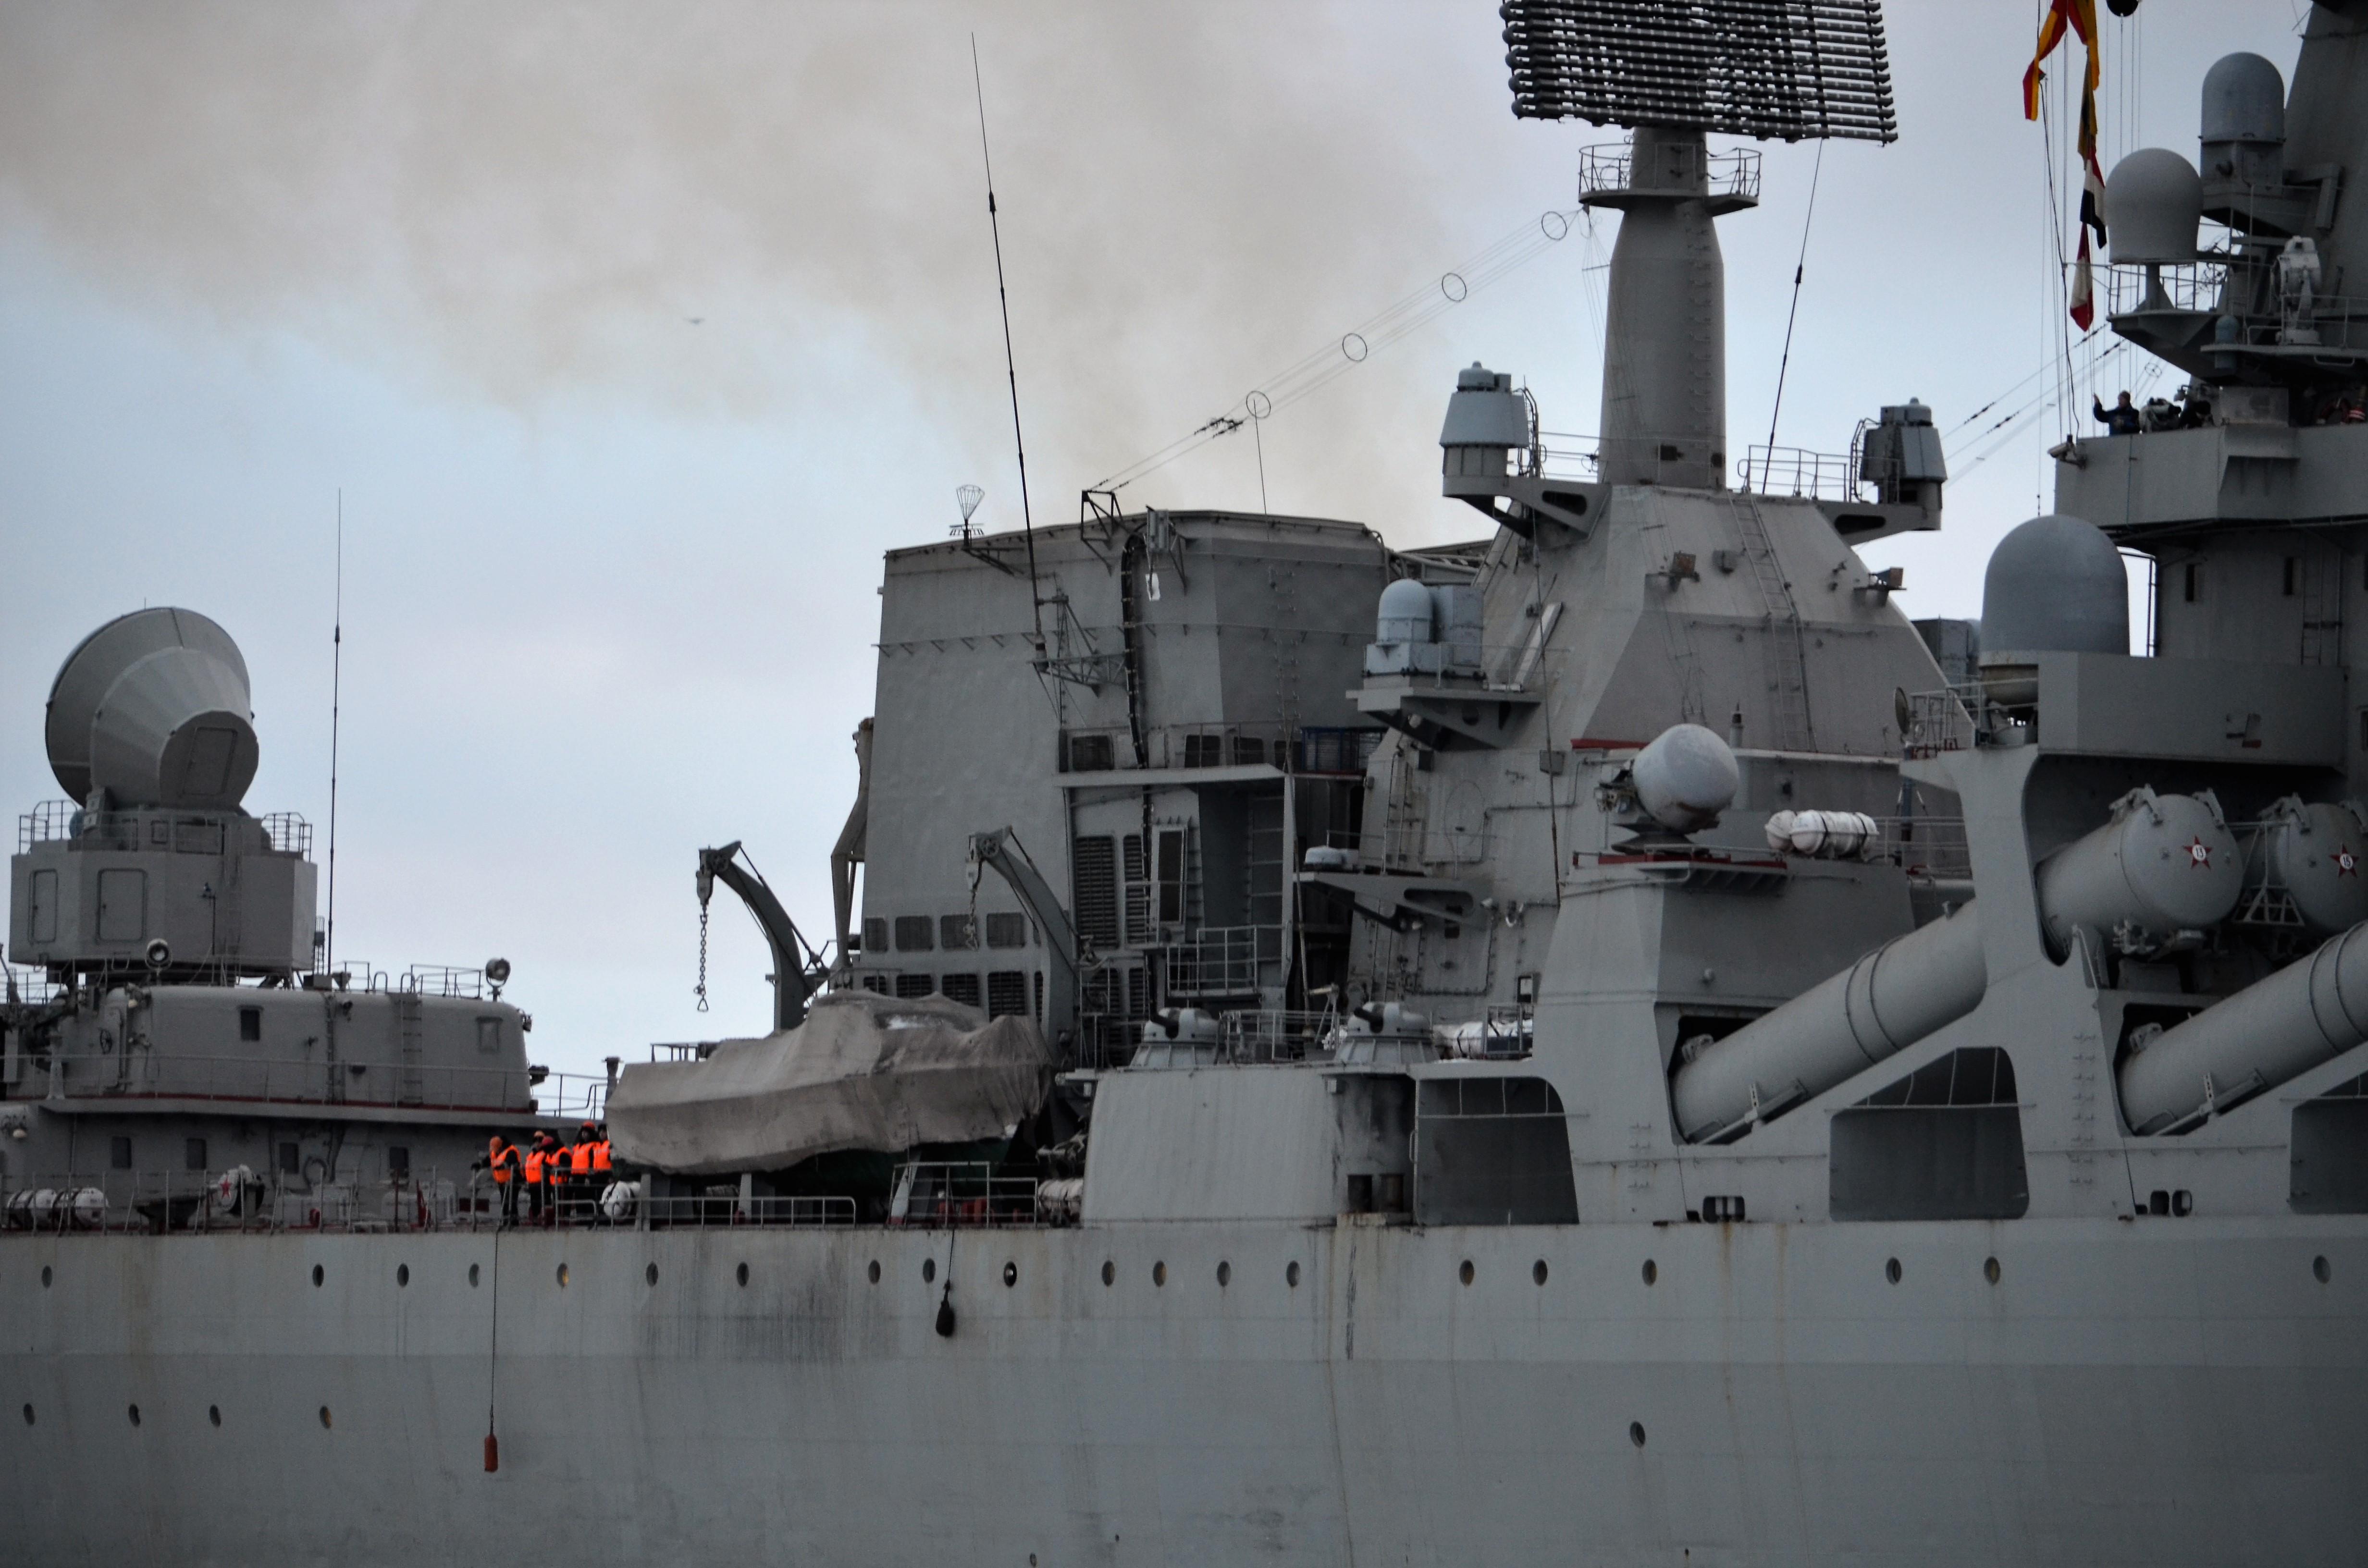 Project 1164 Atlant: Slava Class cruiser - Page 7 30-4454281-dsc-9689-2-